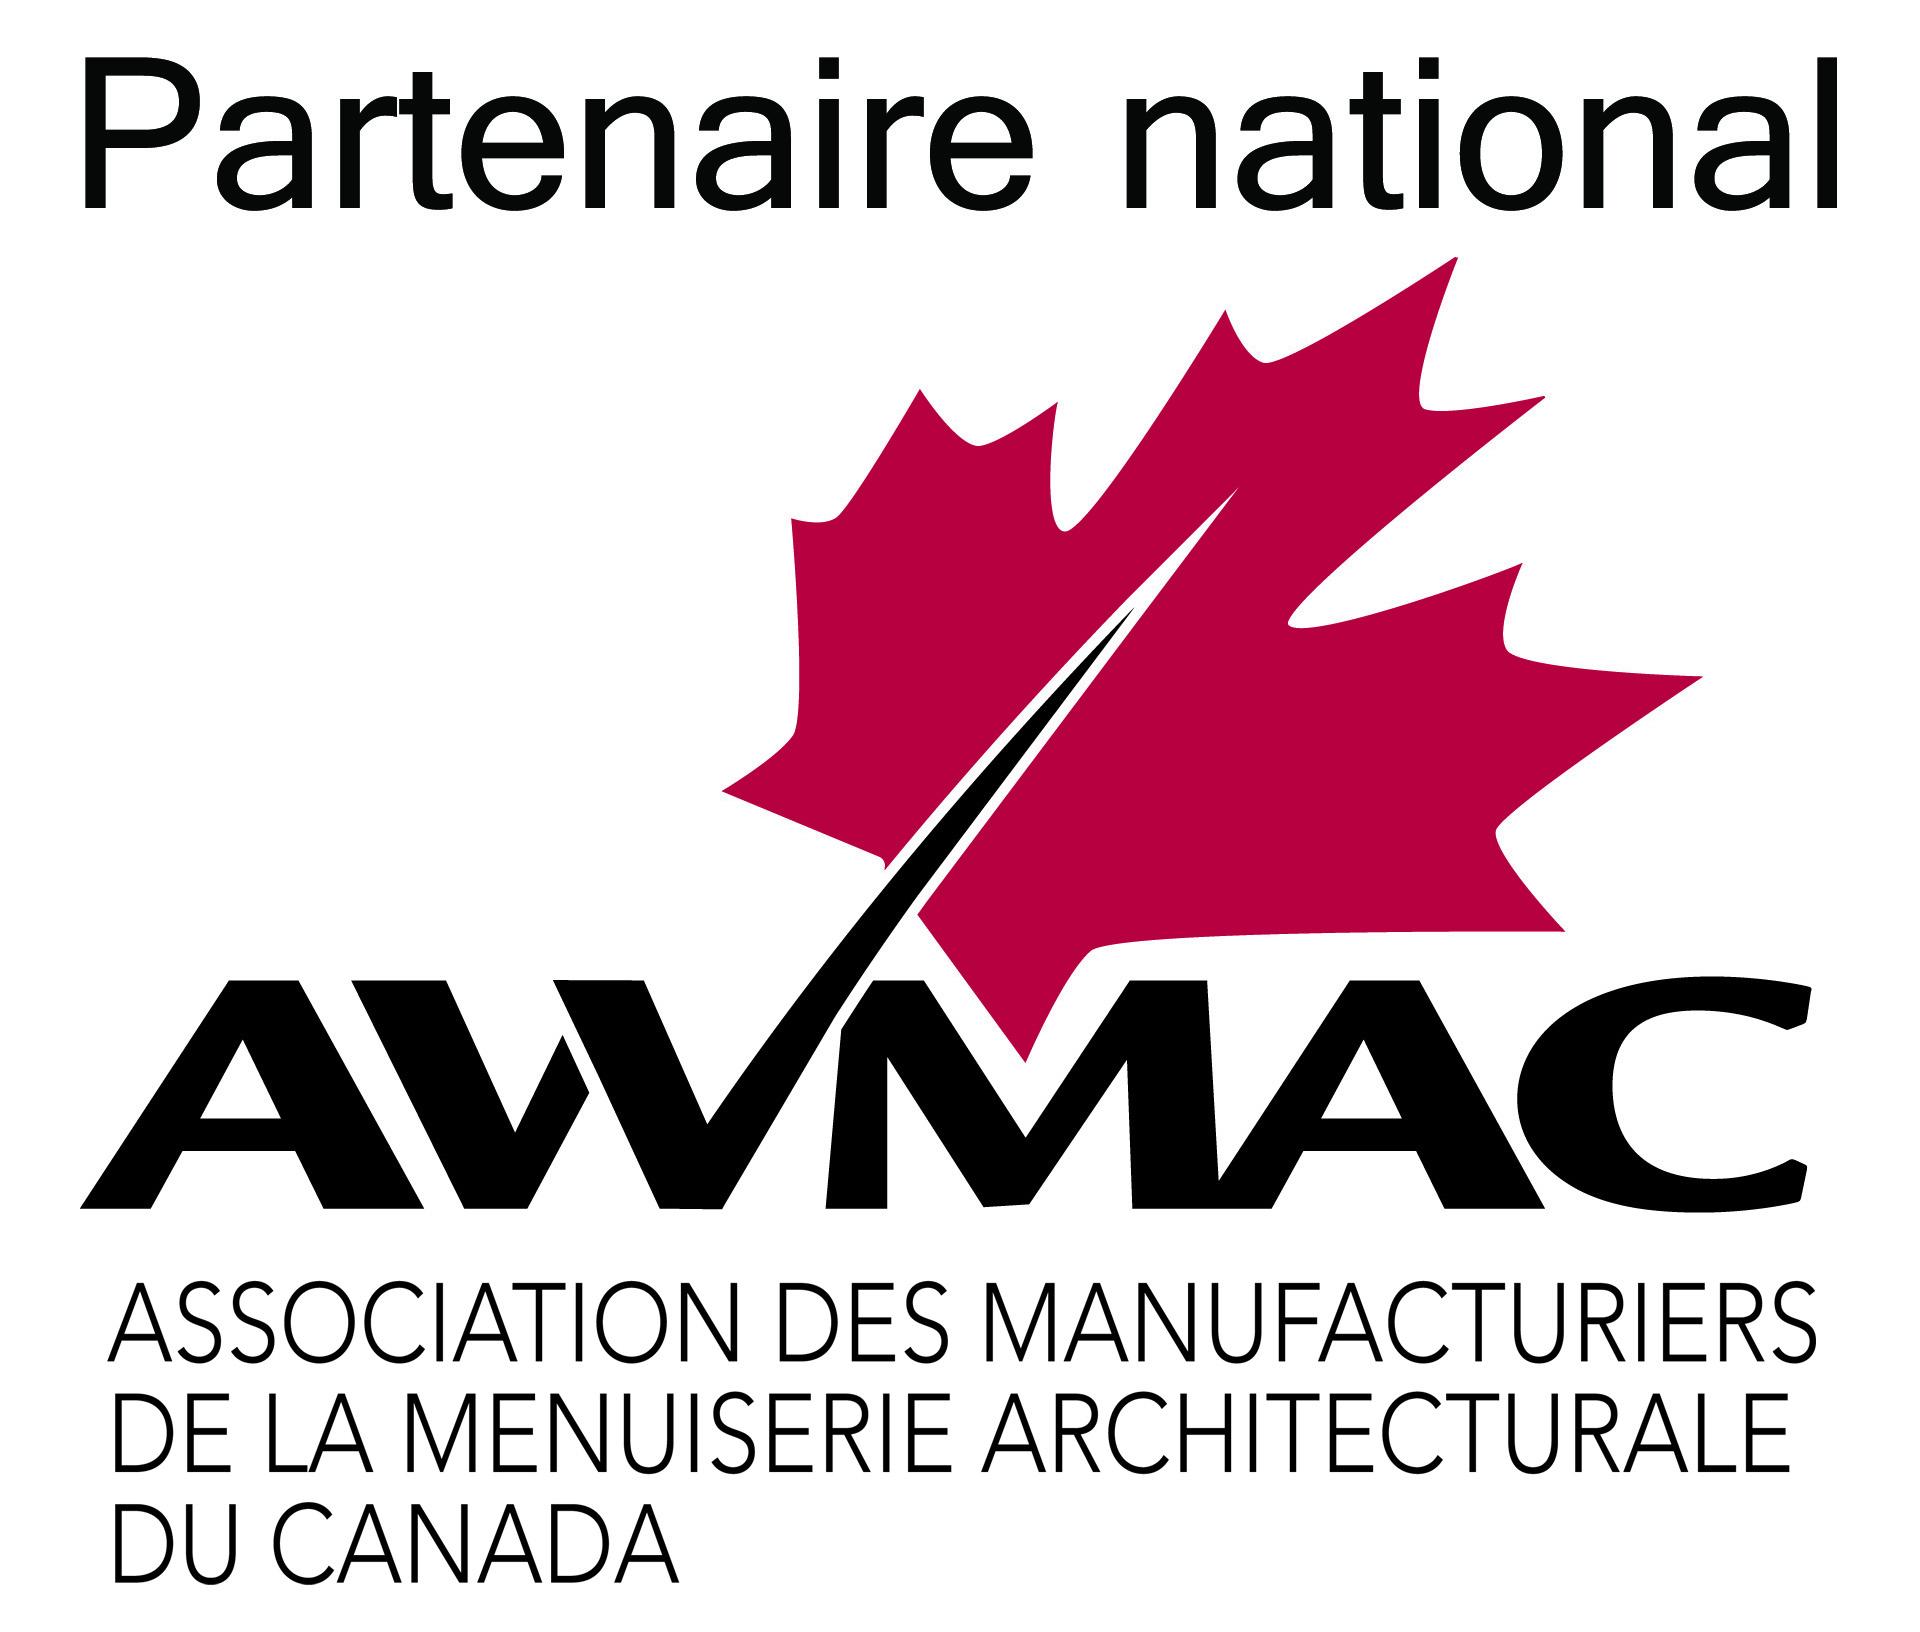 AWMAC 2C